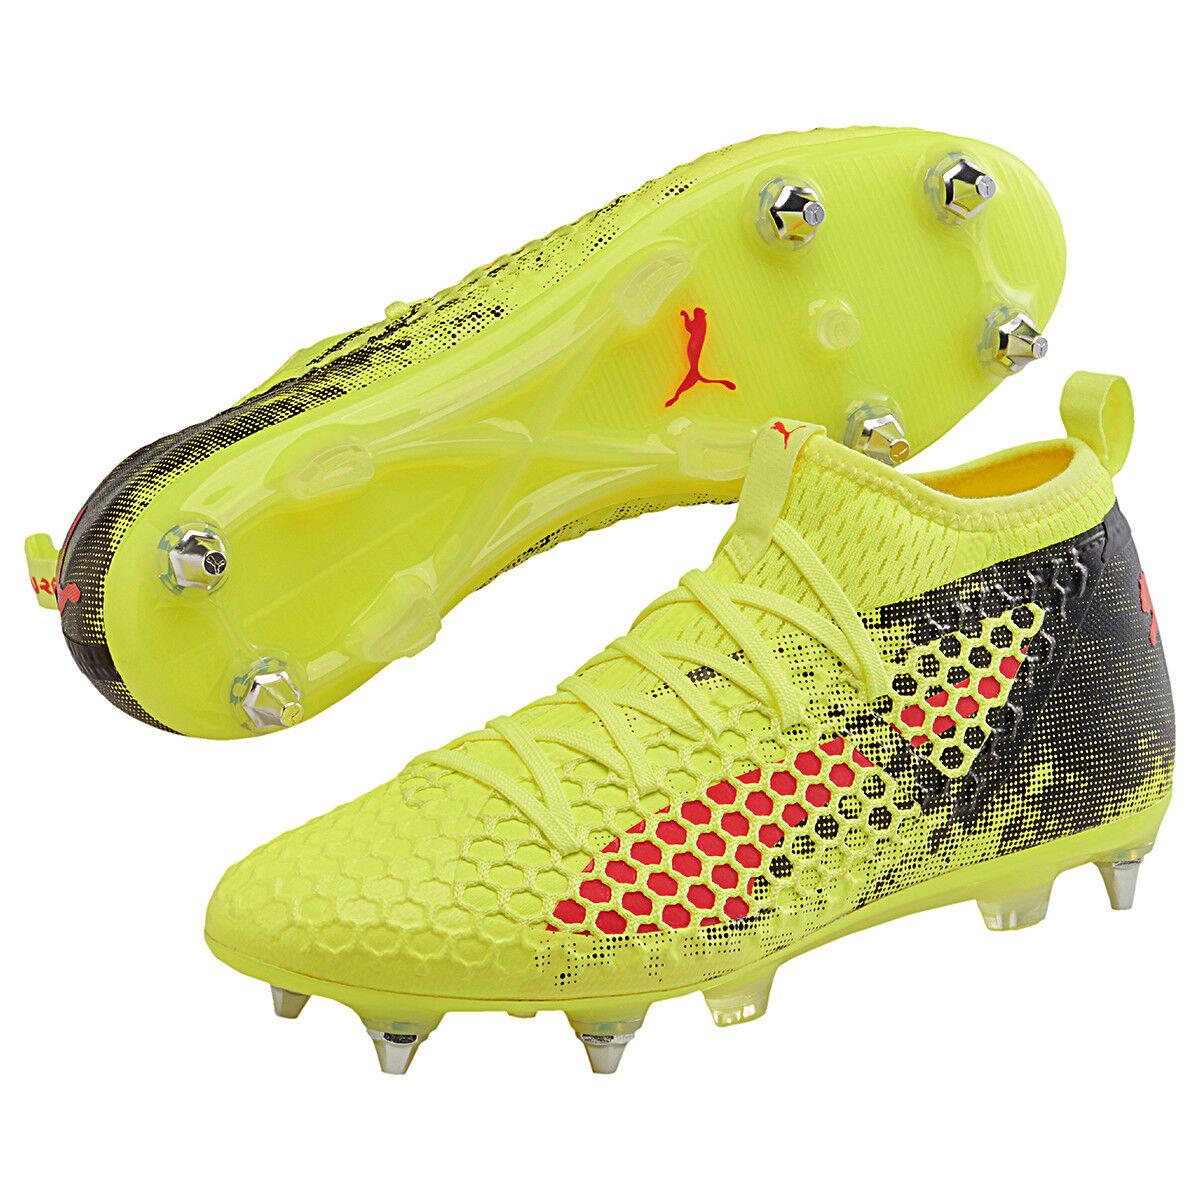 Puma botas Fútbol Hombre Futuro 18.2 Netfix Mx Sg Fútbol Amarillo 104319 01